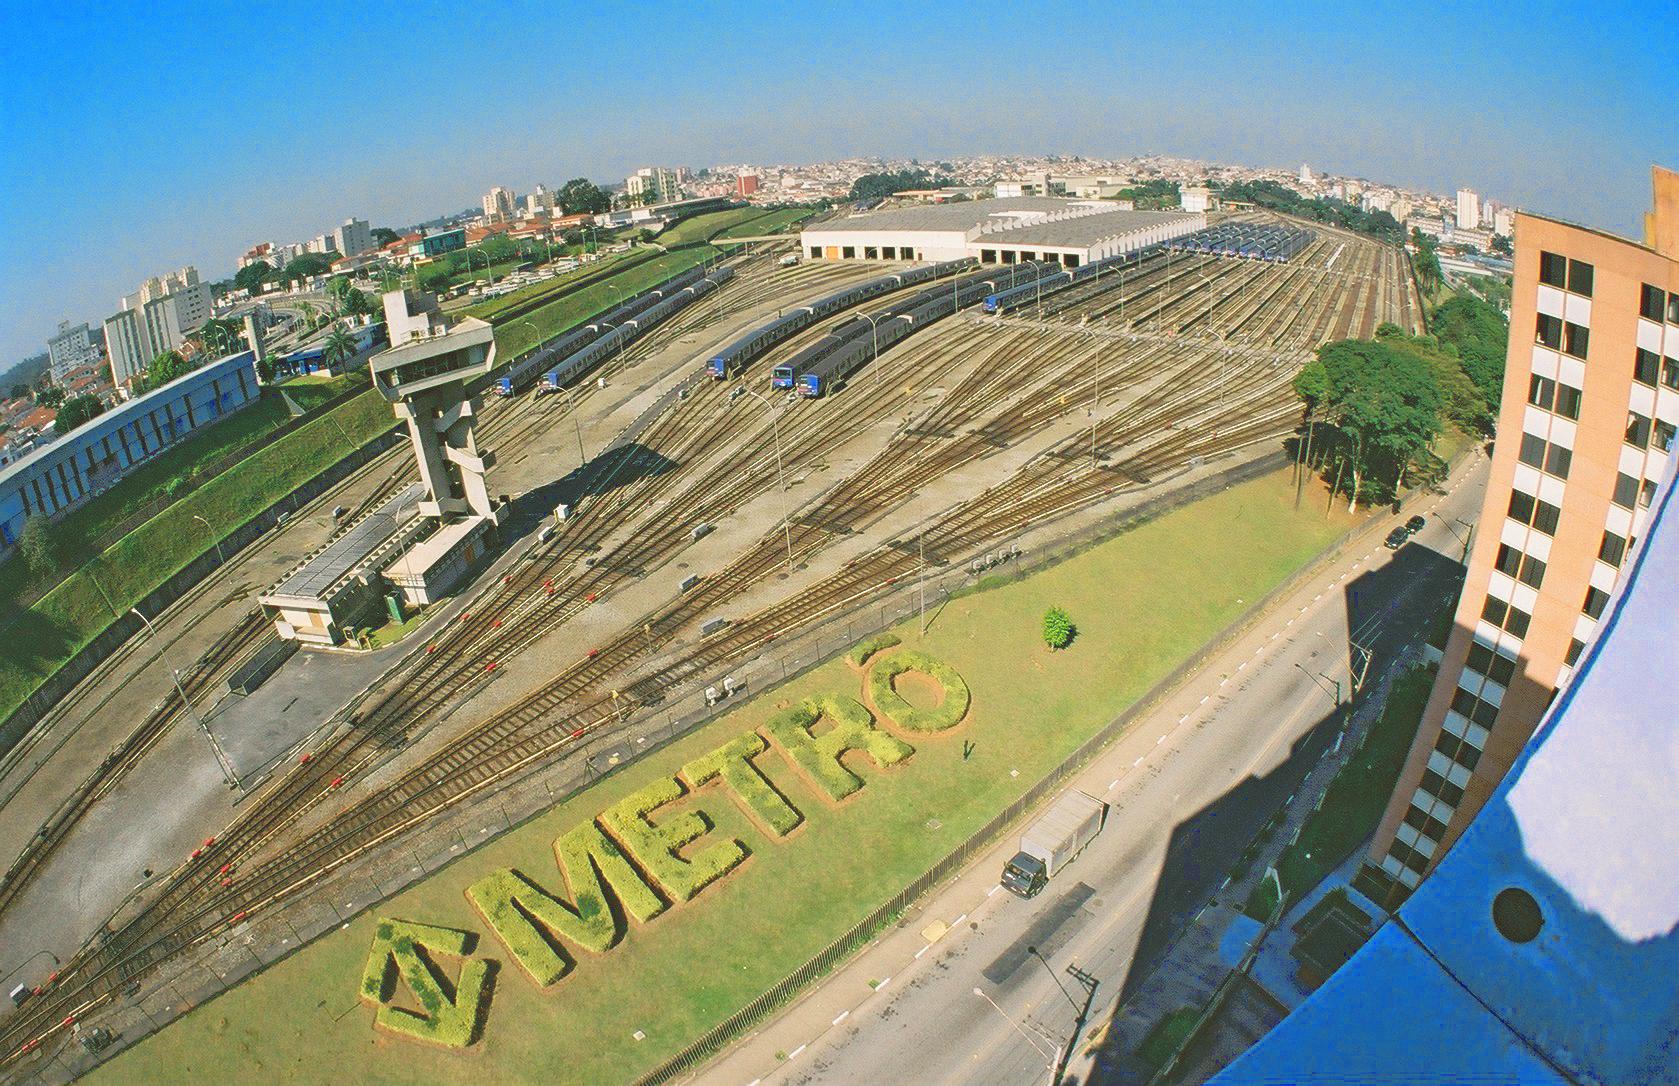 Pátio-Jabaquara-Metrô-SP